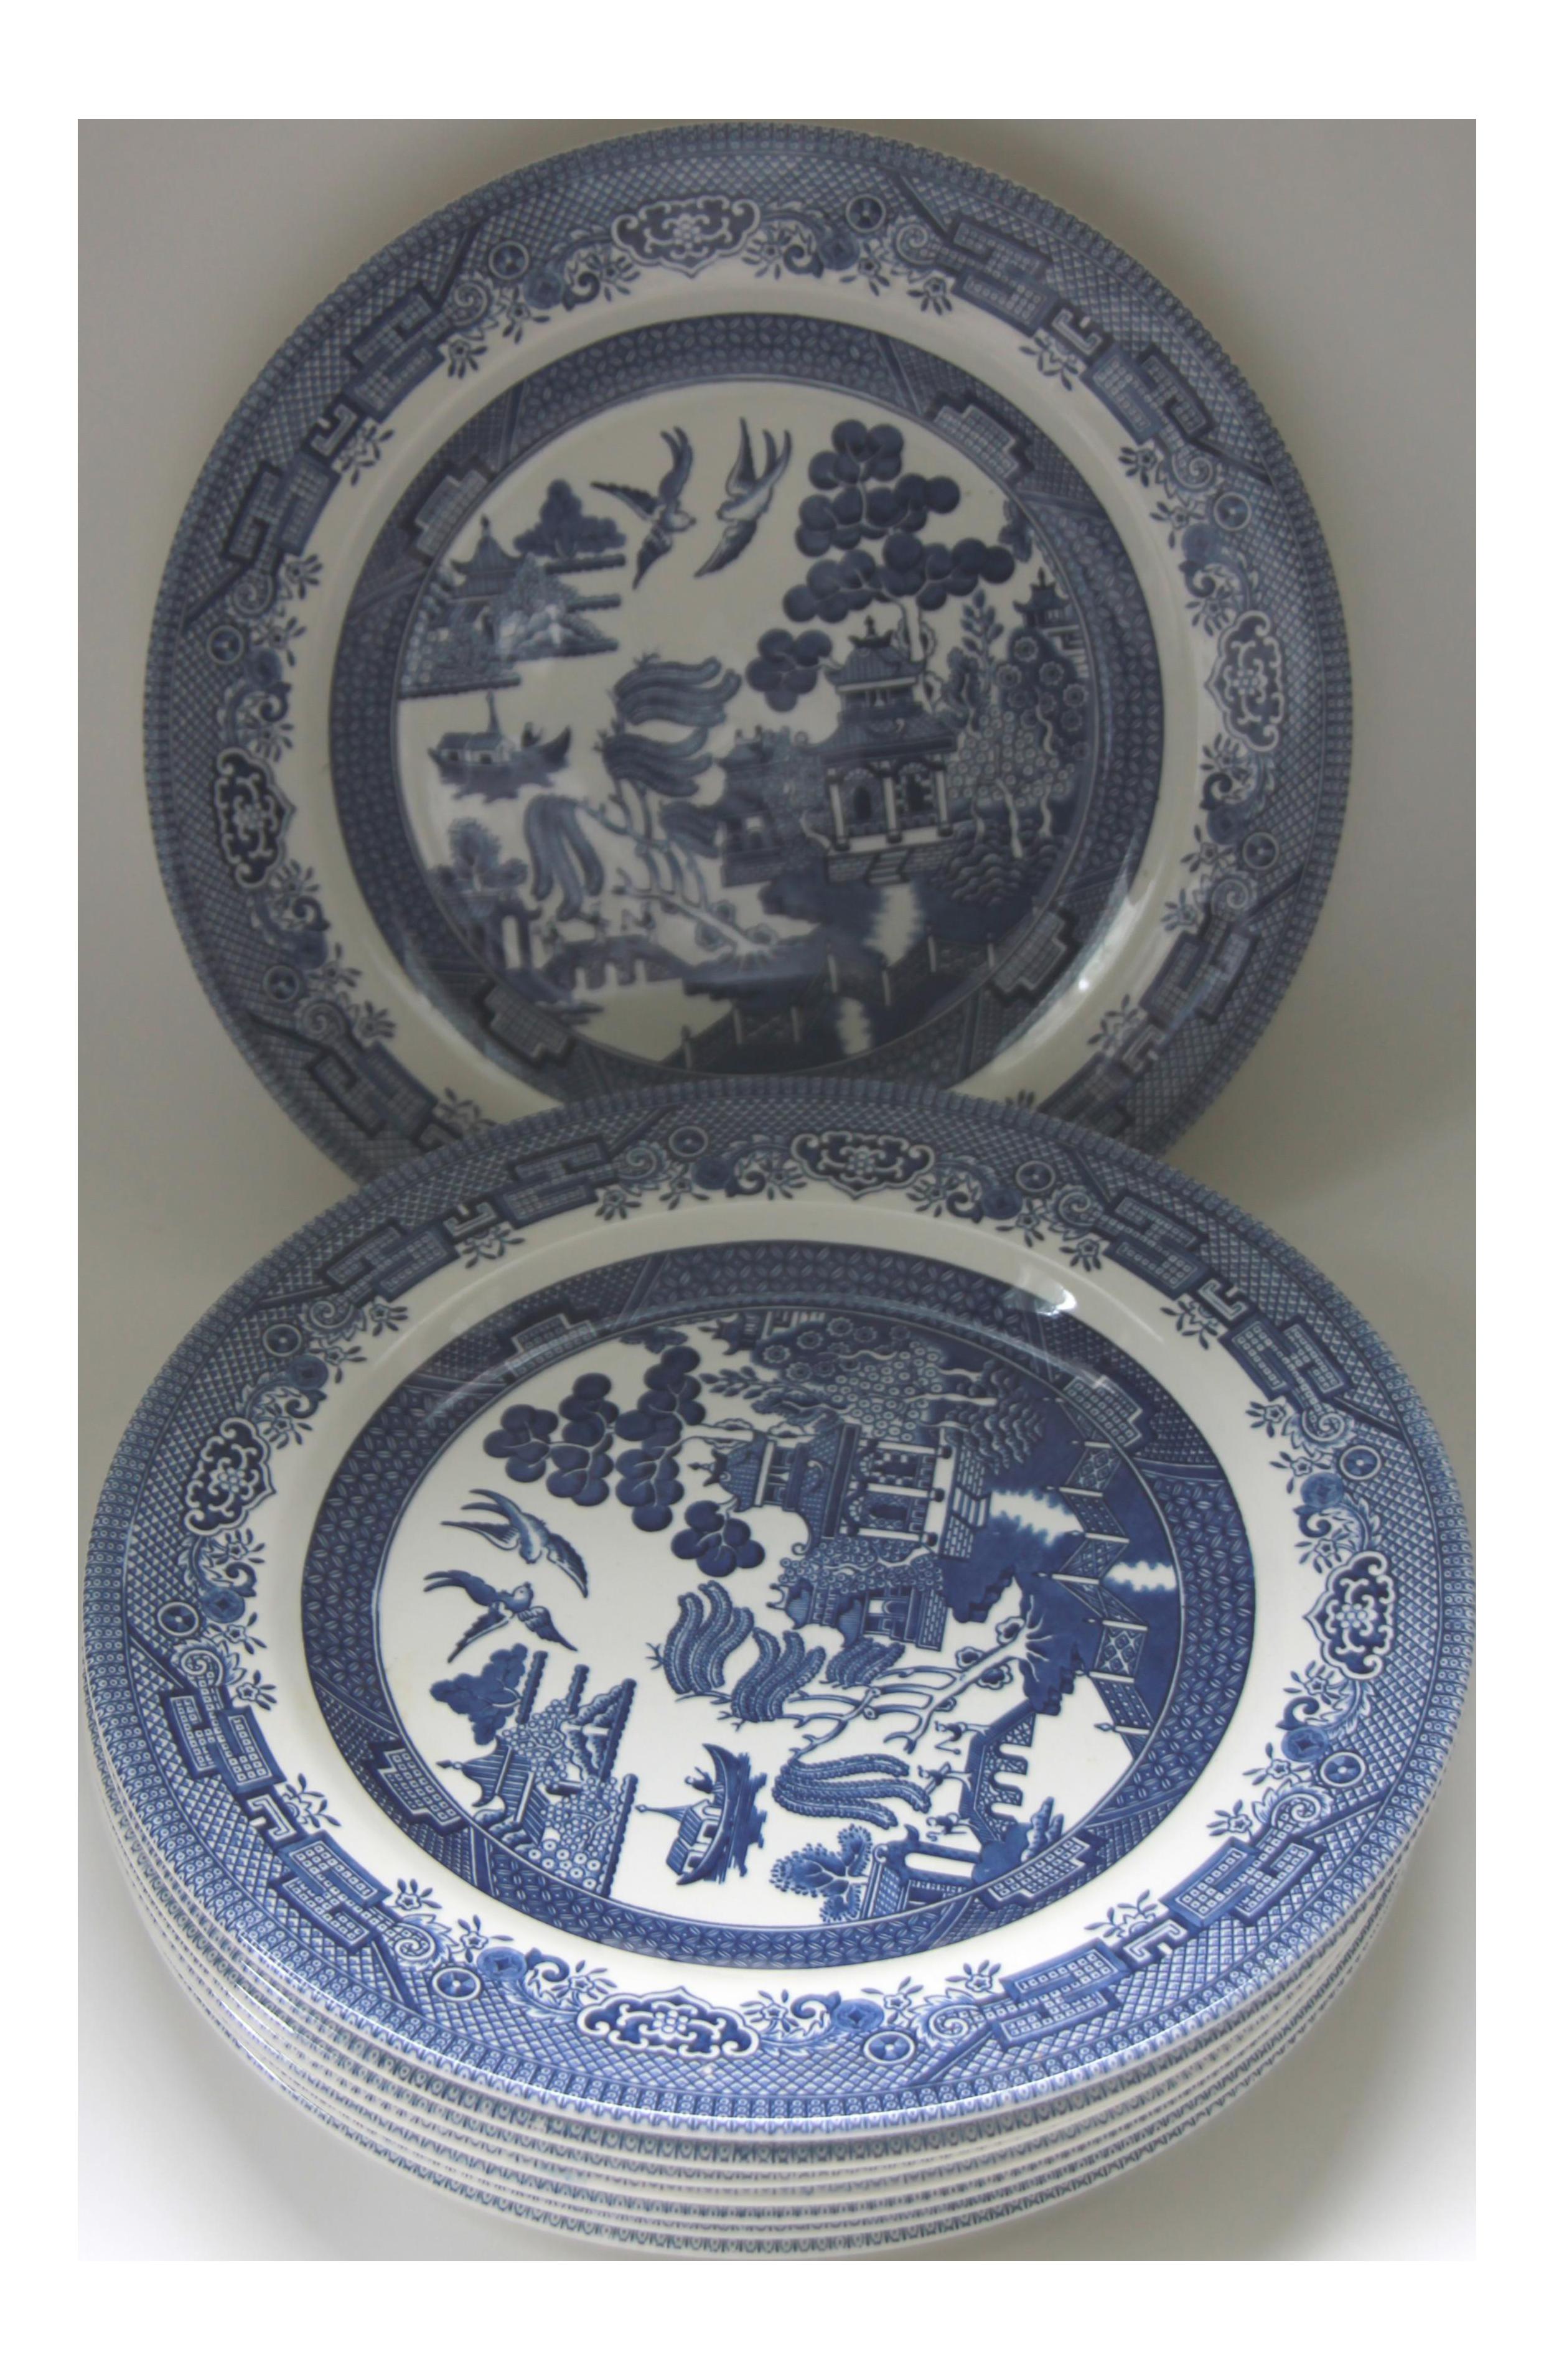 sc 1 st  Chairish & Blue Willow Churchill Transferware Dinner Plates - Set of 8 | Chairish